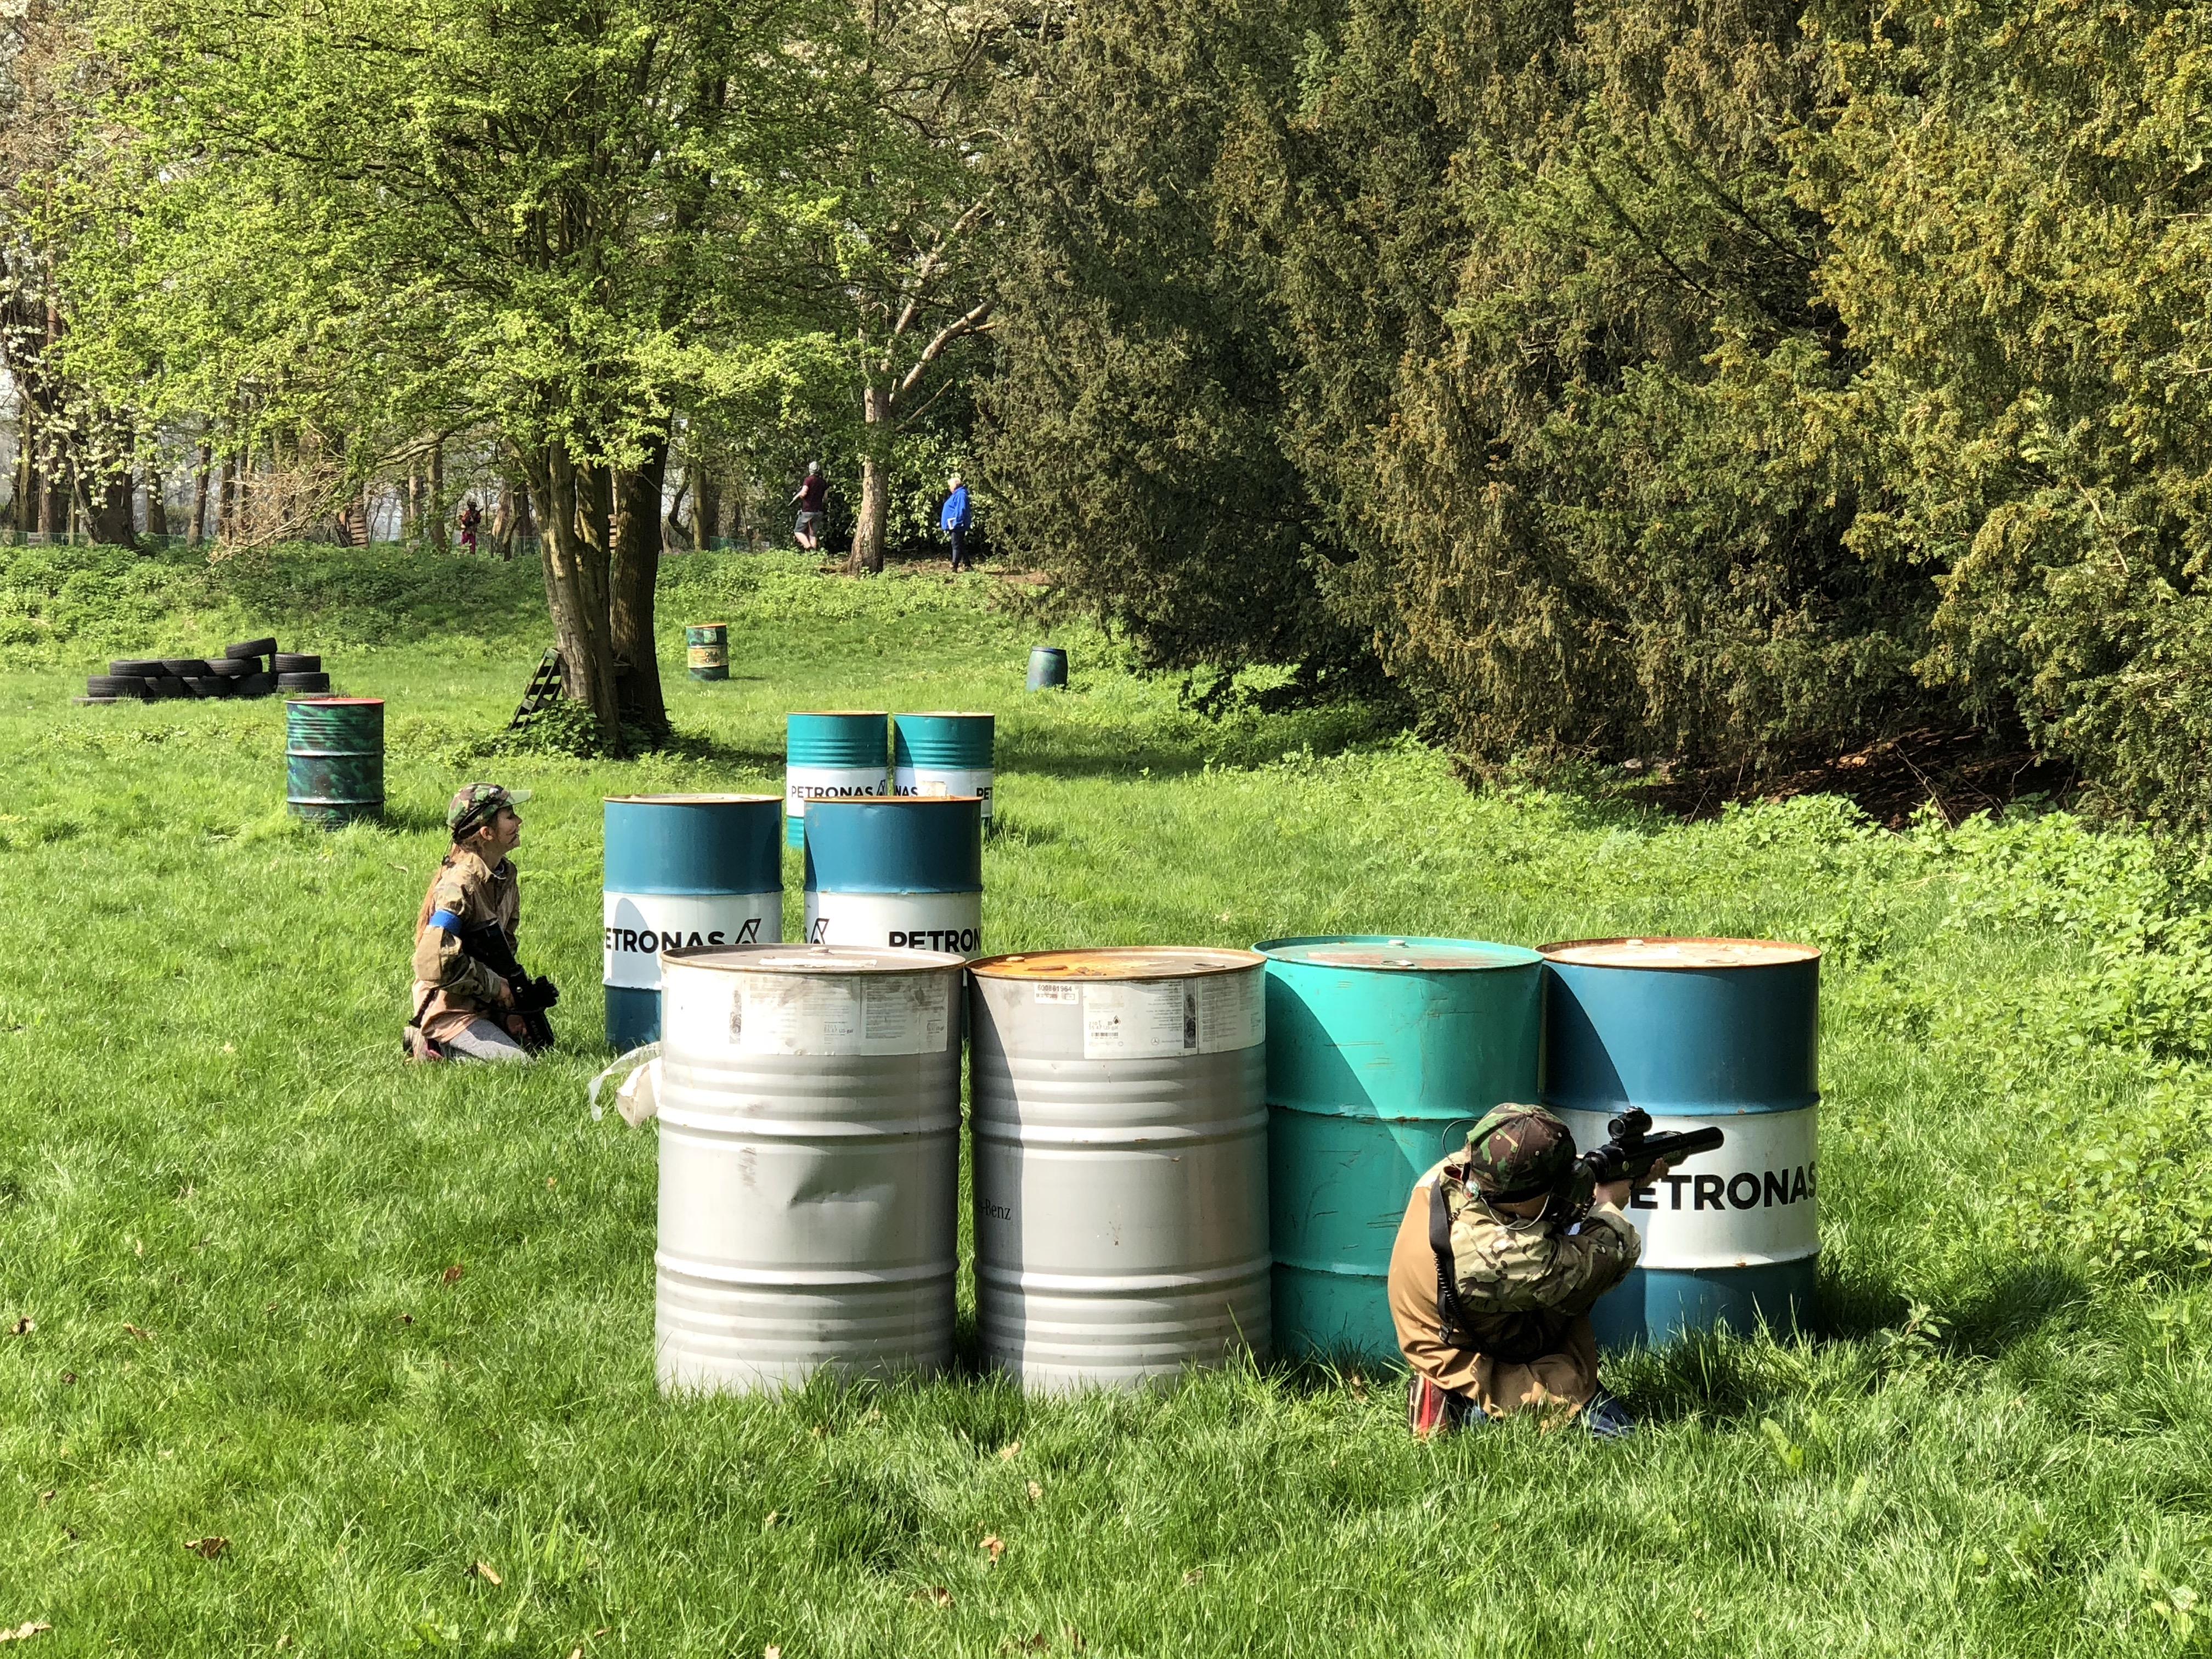 Hide behind the barrels